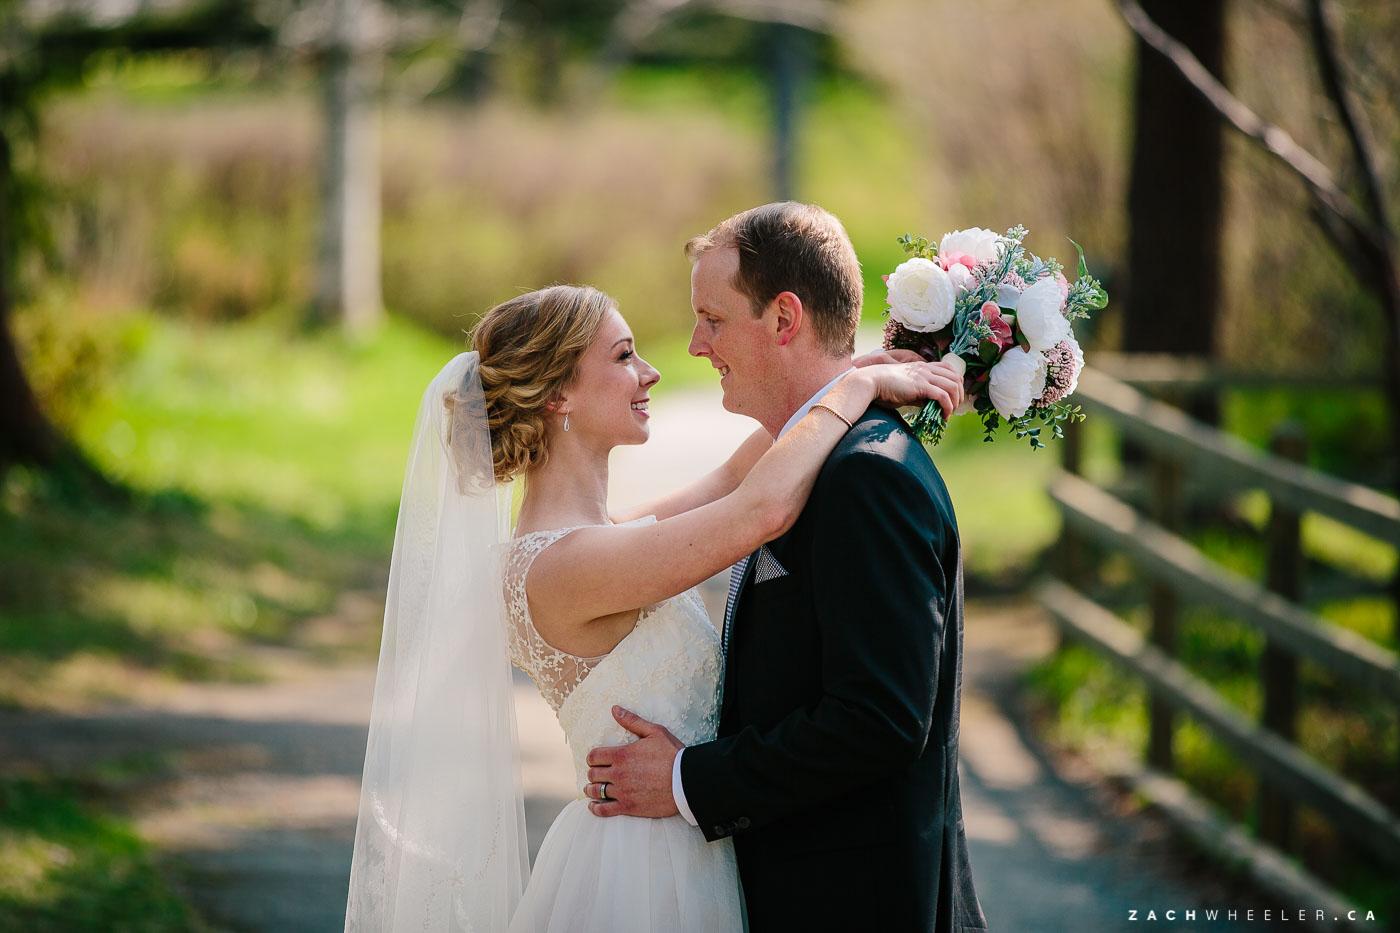 Sarah-Grant-Lesters-Fram-Wedding-47